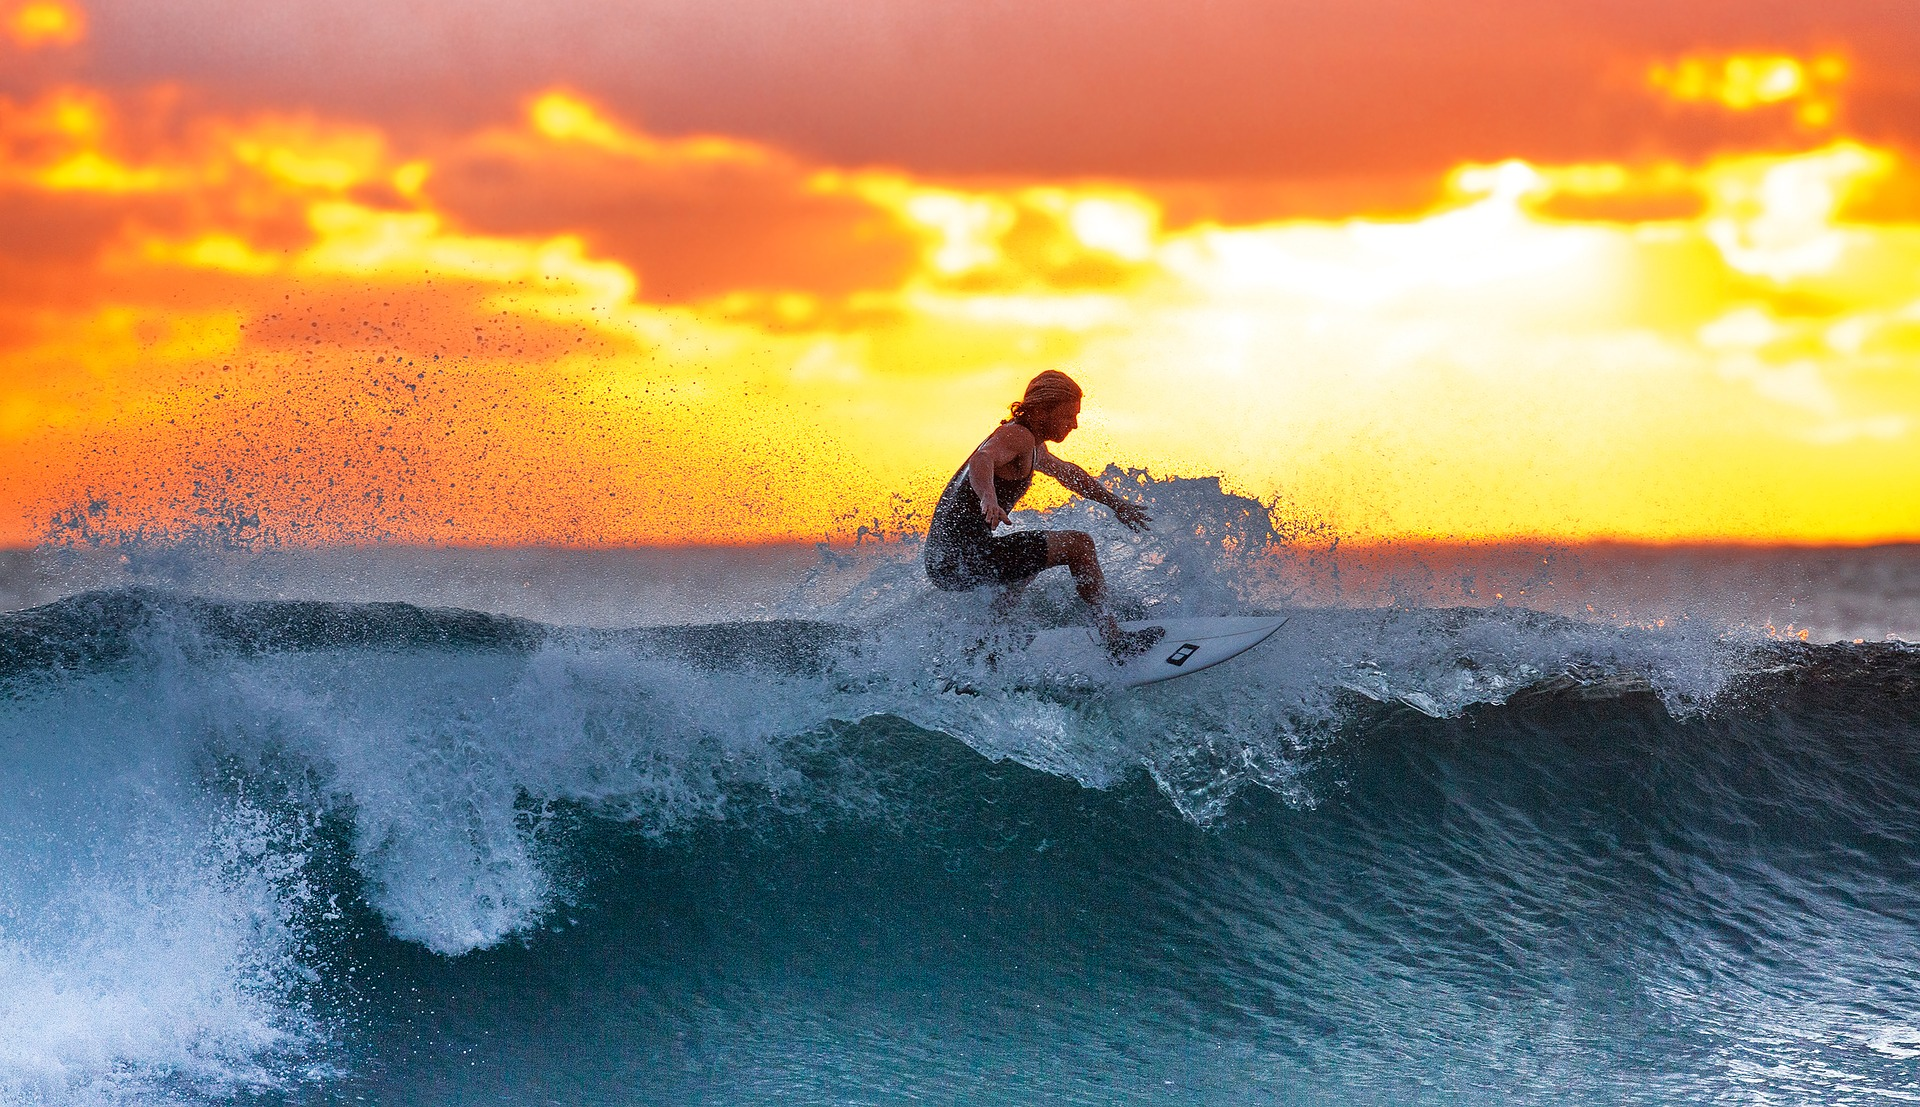 surfer-2212948_1920.jpg